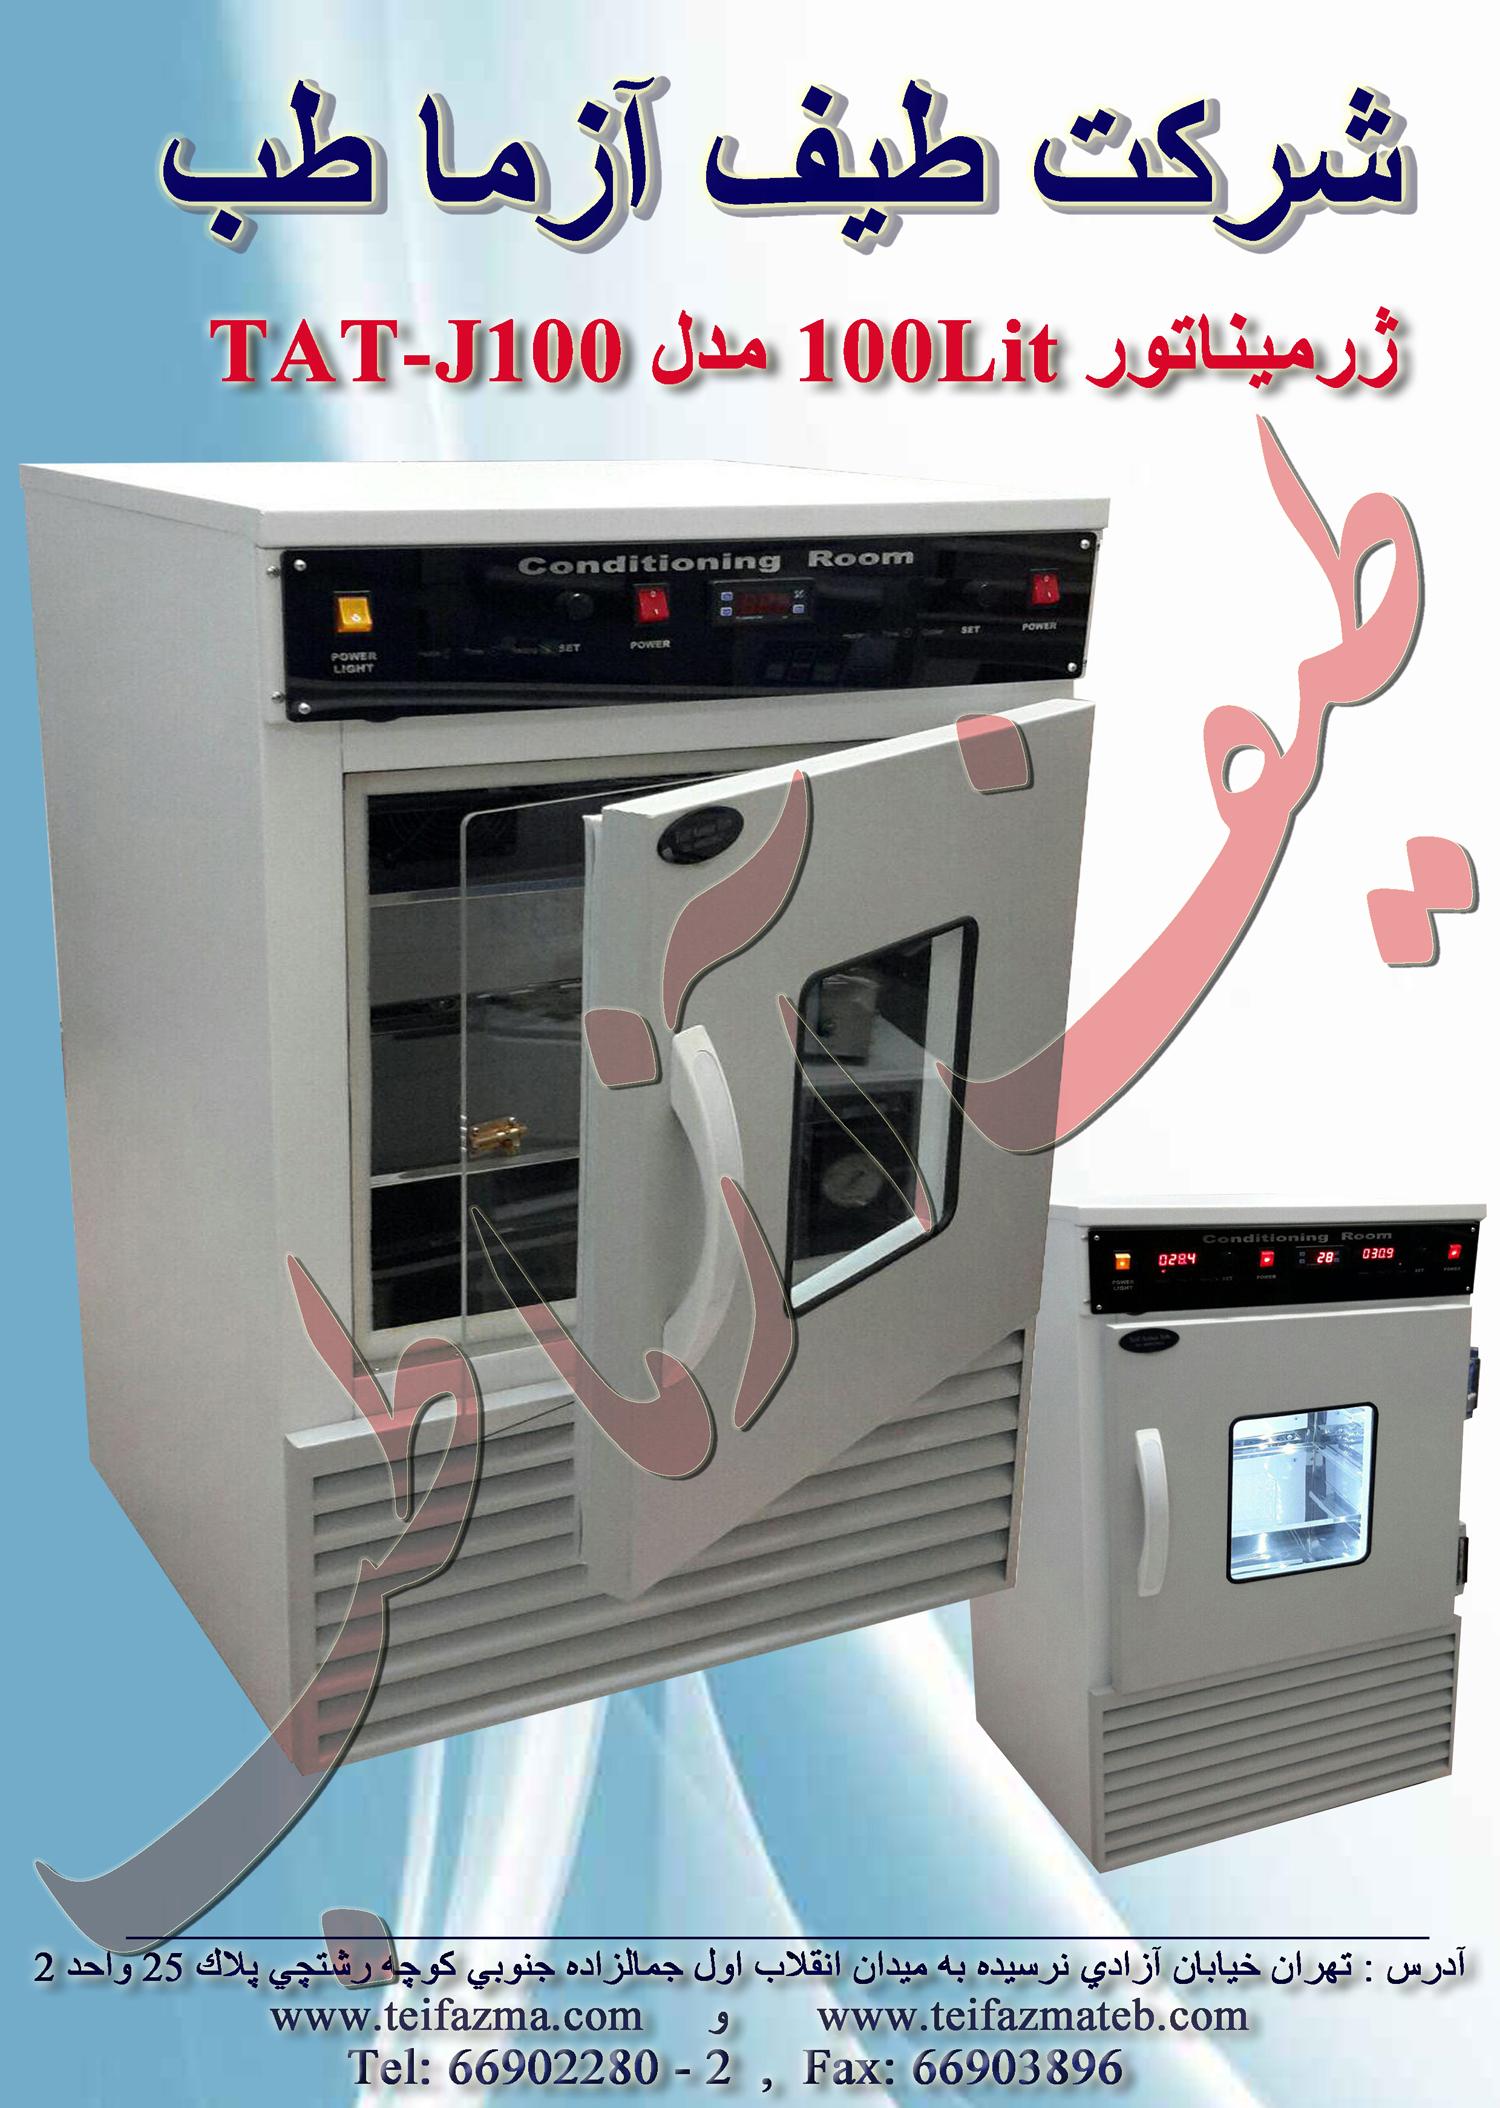 دستگاه ژرمیناتور ۱۰۰ لیتر